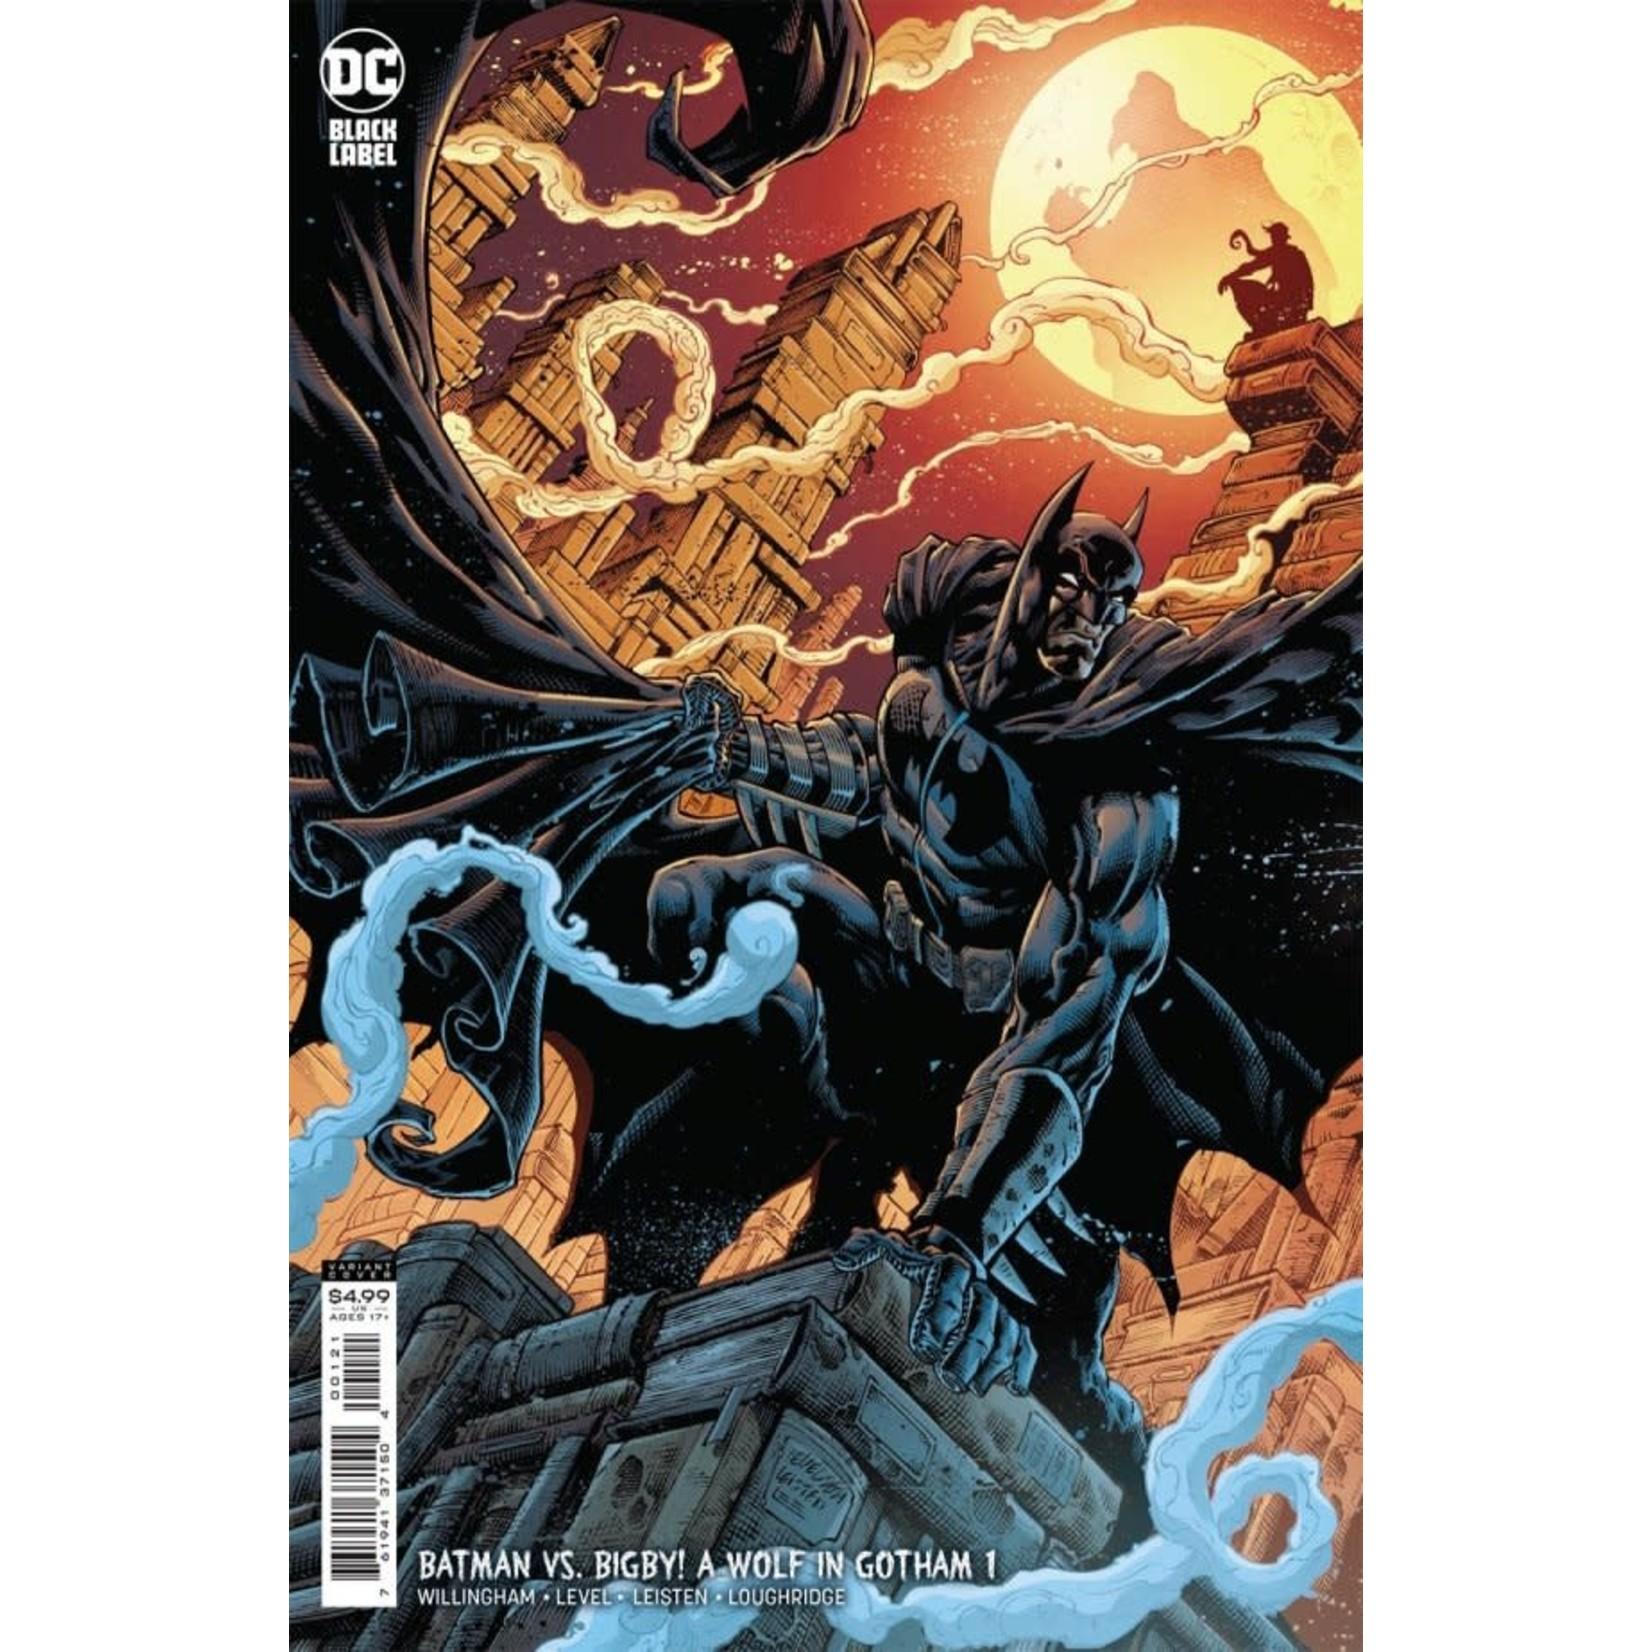 DC Comics Batman vs. Bigby! A Wolf in Gotham #1 Cover B Level & Leisten Card Stock Variant